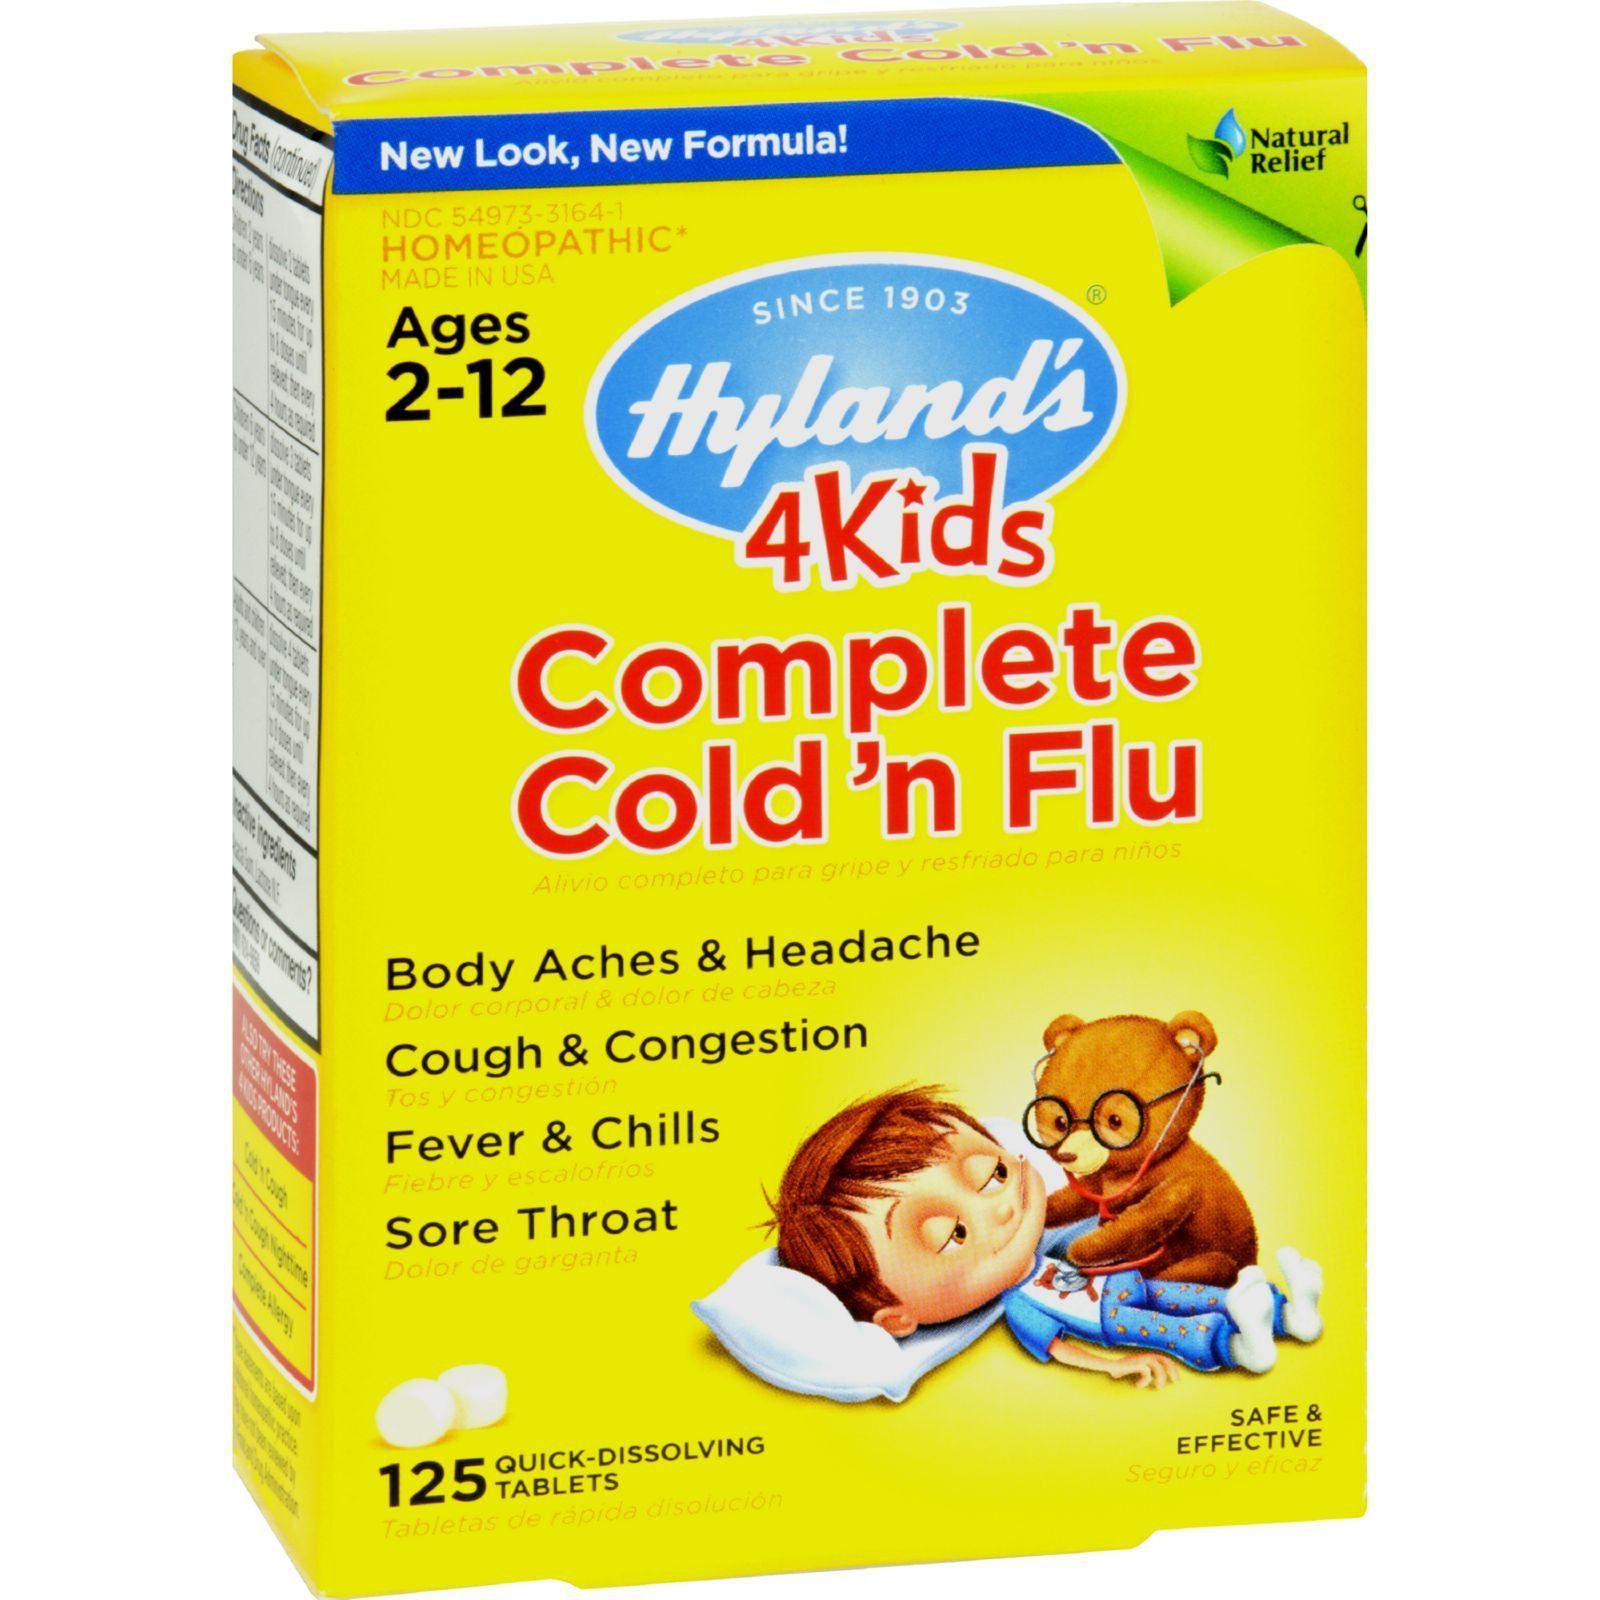 Hylands Homeopathic Complete Flu Care 4 Kids - 125 Tablets